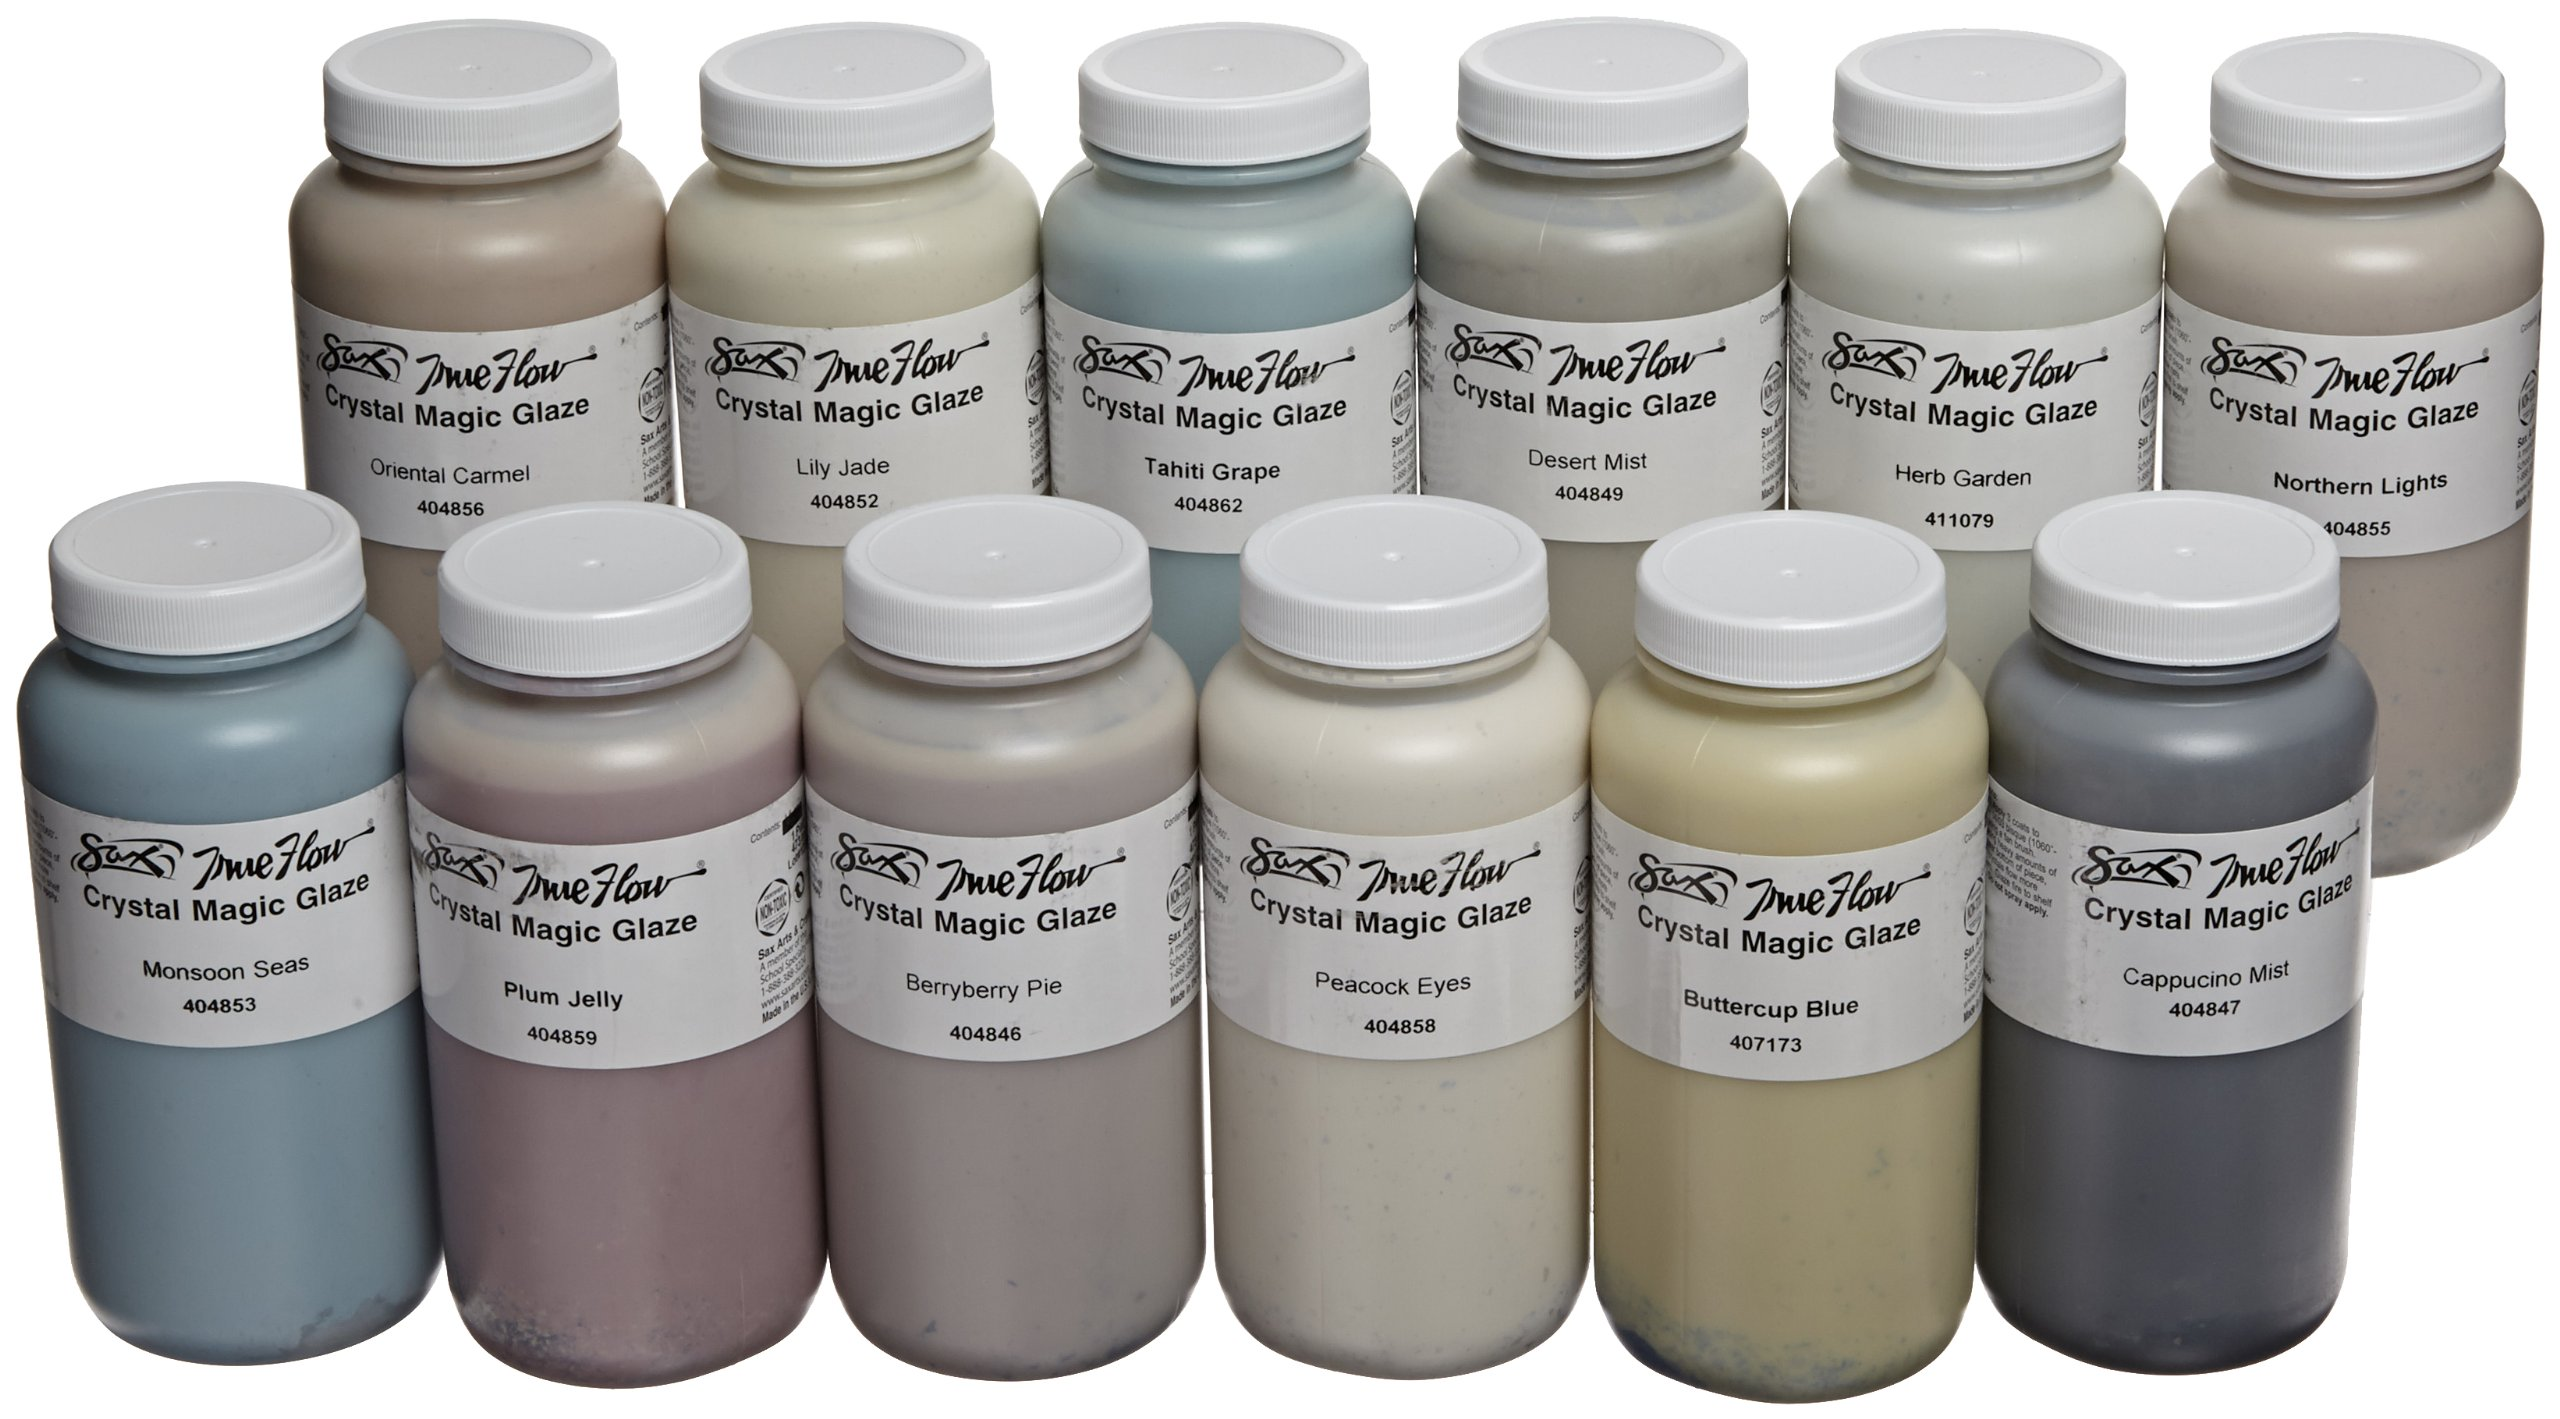 Sax True Flow Crystal Magic Glazes, Assorted Colors, Set of 12 Pints - 406470